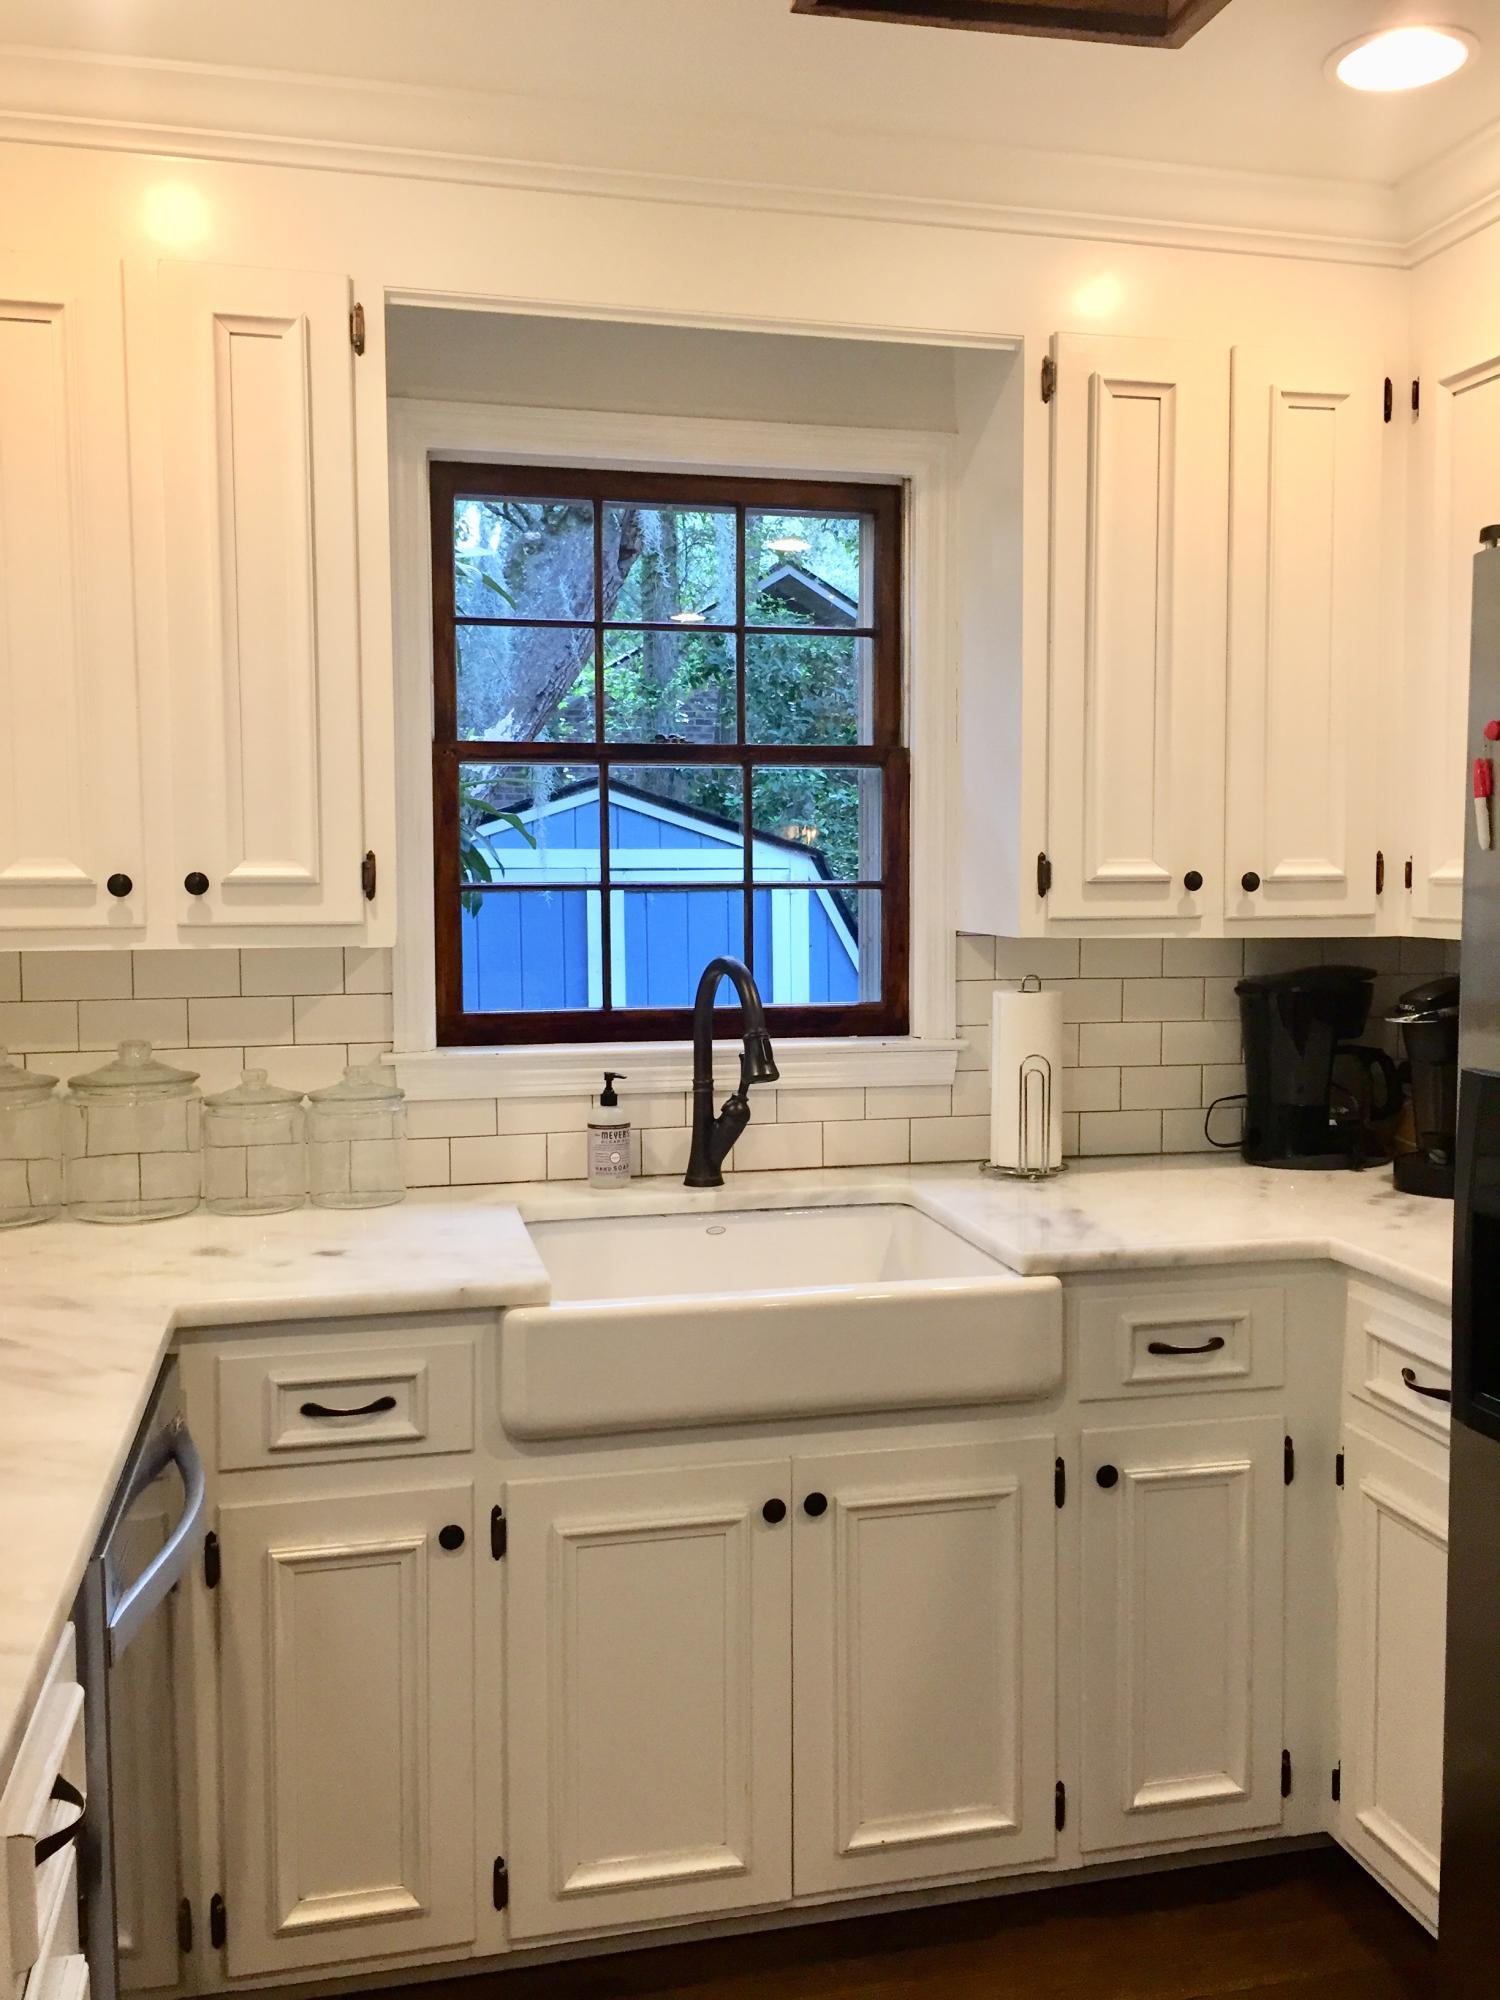 Sandhurst Homes For Sale - 3 Hampton, Charleston, SC - 3